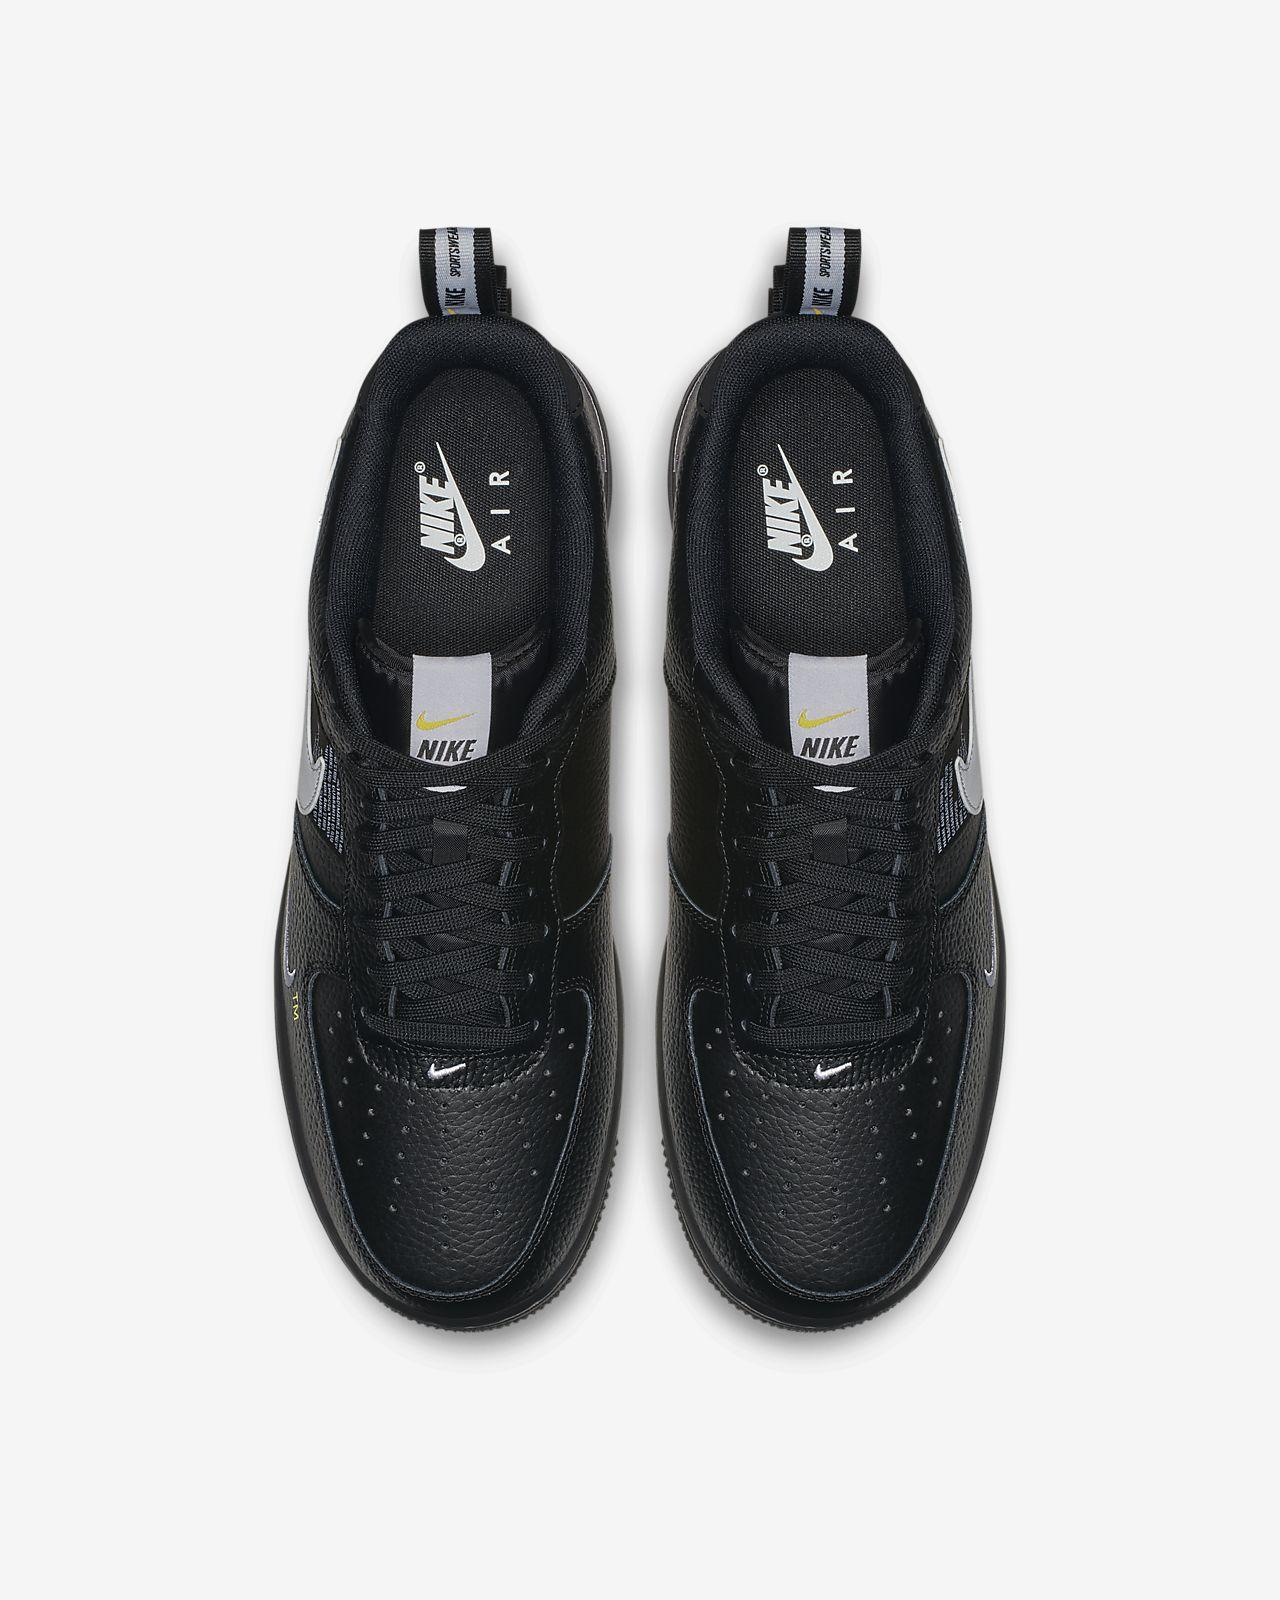 separation shoes 691c8 0fb72 ... Nike Air Force 1 07 LV8 Utility Mens Shoe